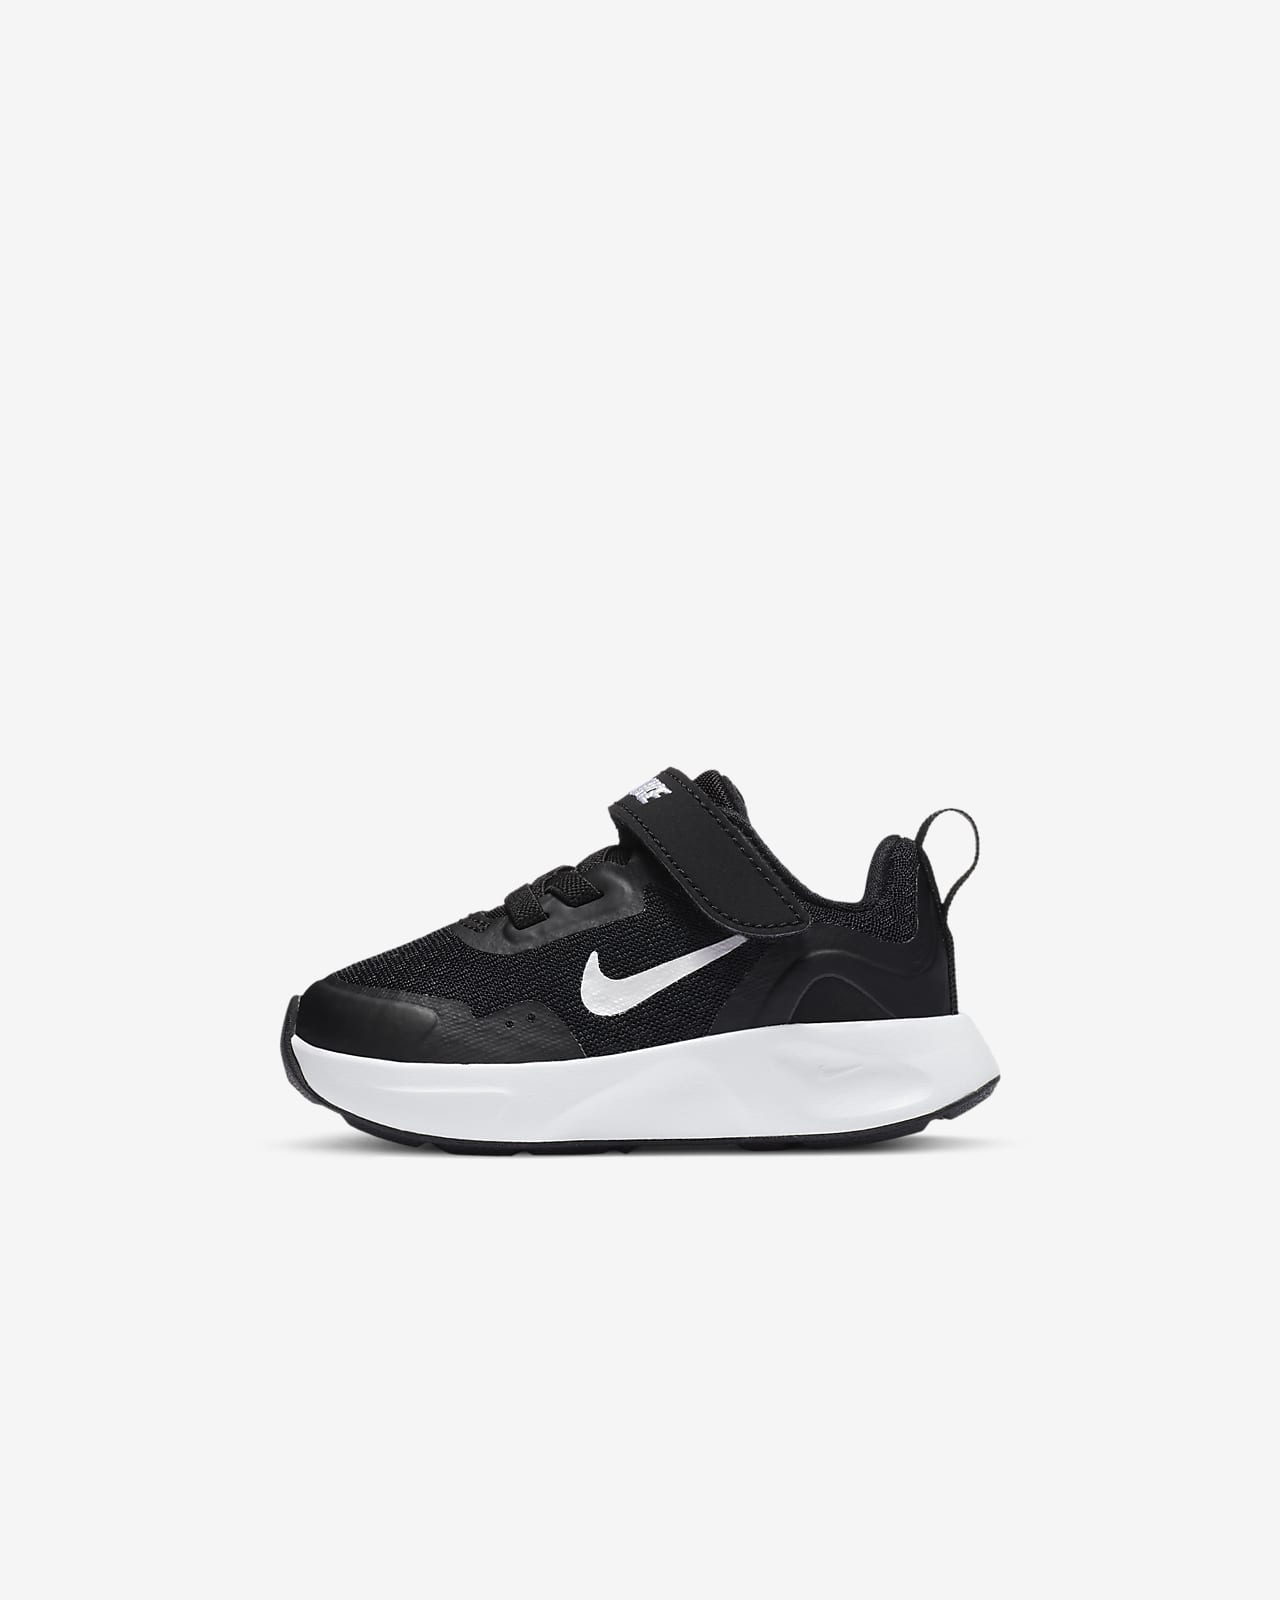 Nike WearAllDay sko til sped-/småbarn